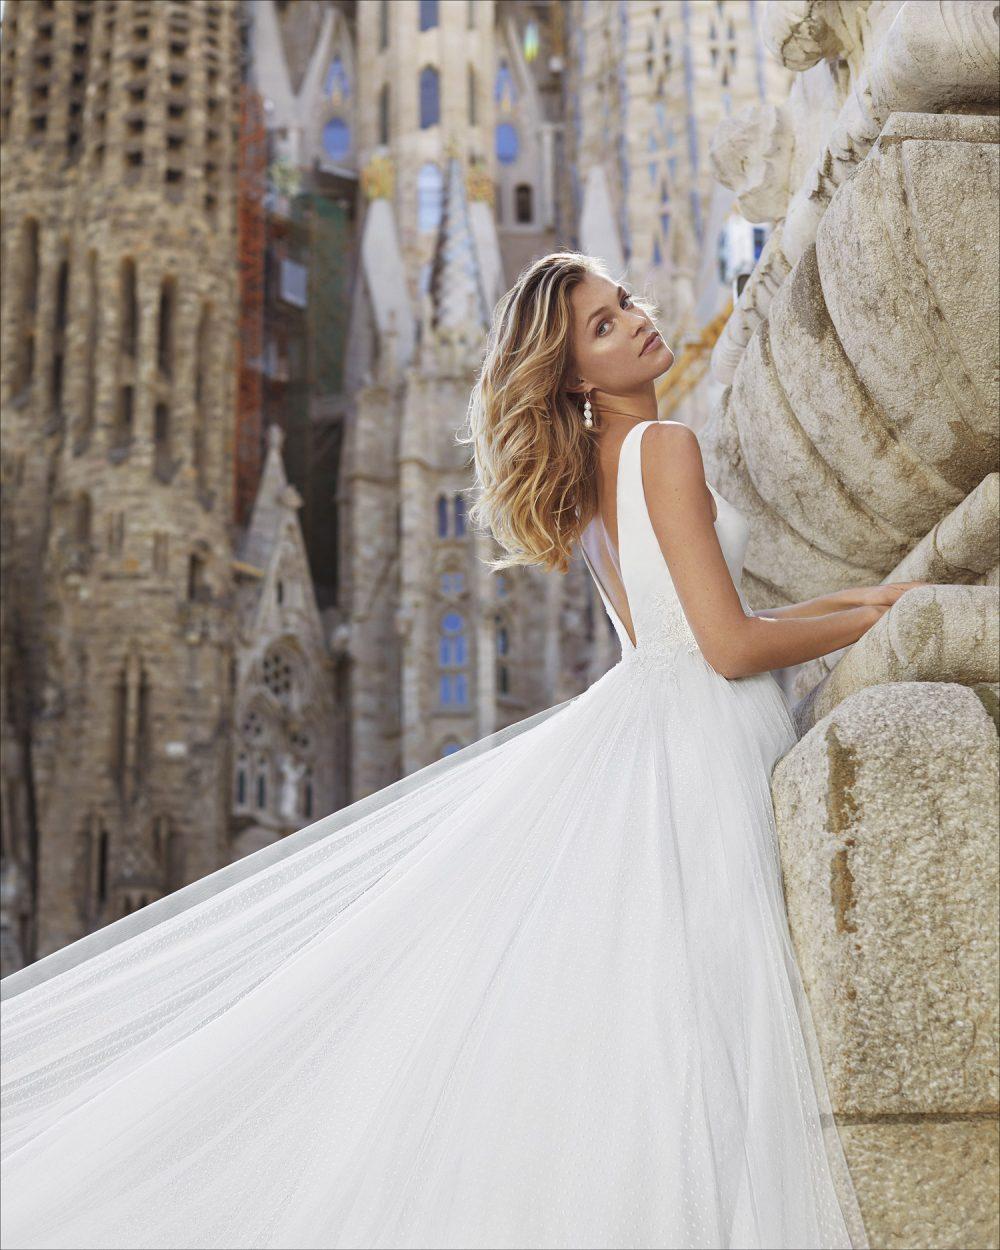 Mariages: abito da sposa Rosa Clarà 2021 a Vicenza, Verona, Padova, Veneto 5S140 YEKARA